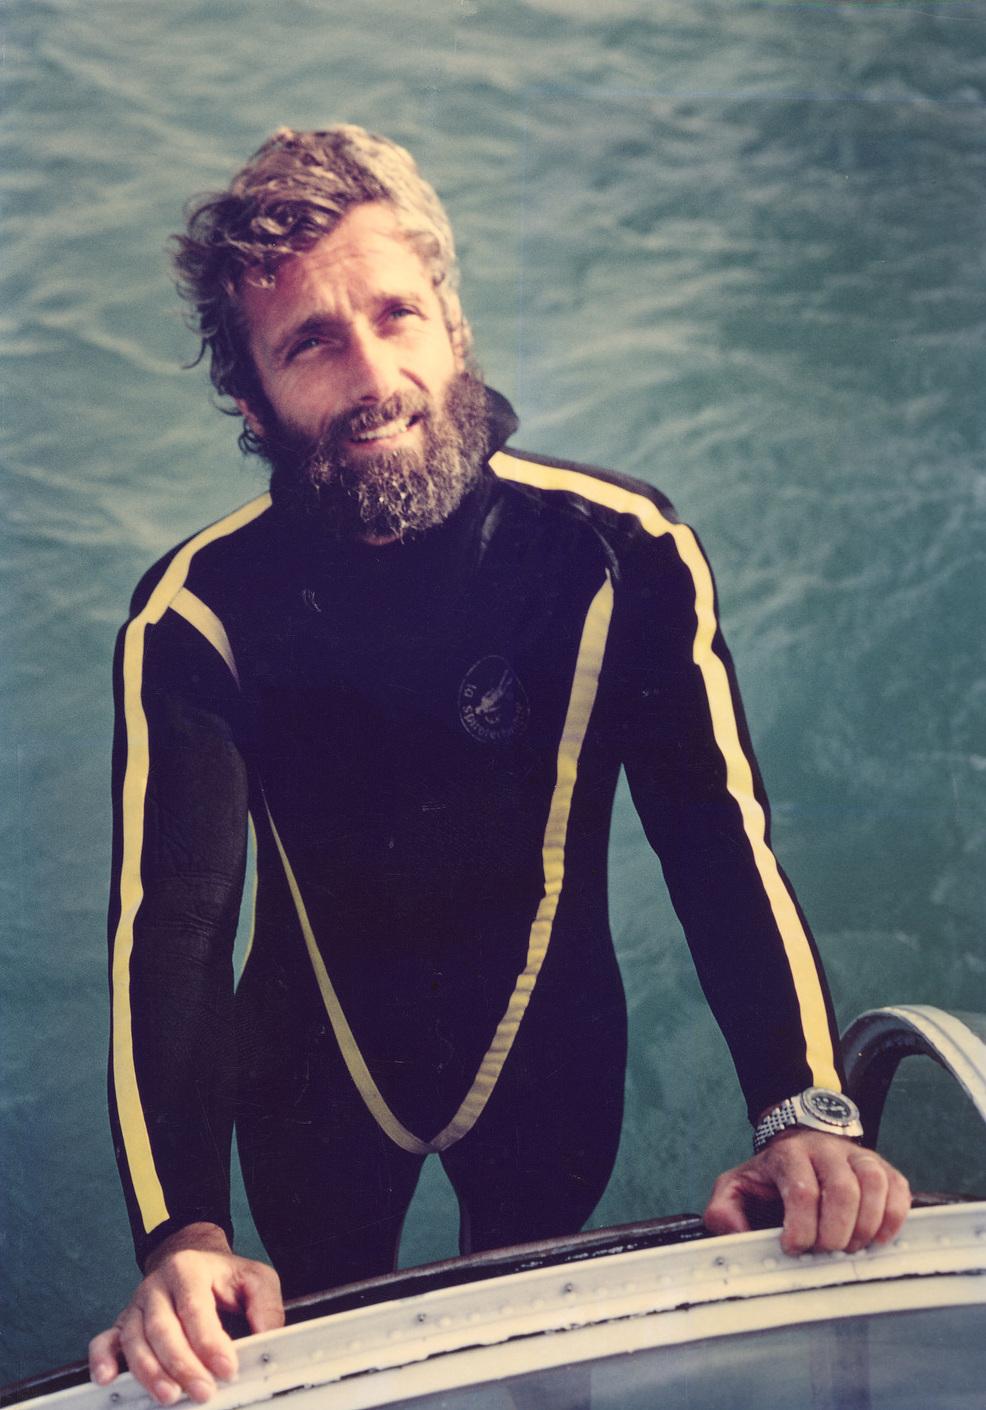 Jacques Yves Cousteau Pierre Yves Cousteau : jacques, cousteau, pierre, Philippe, Cousteau, Wikipedia